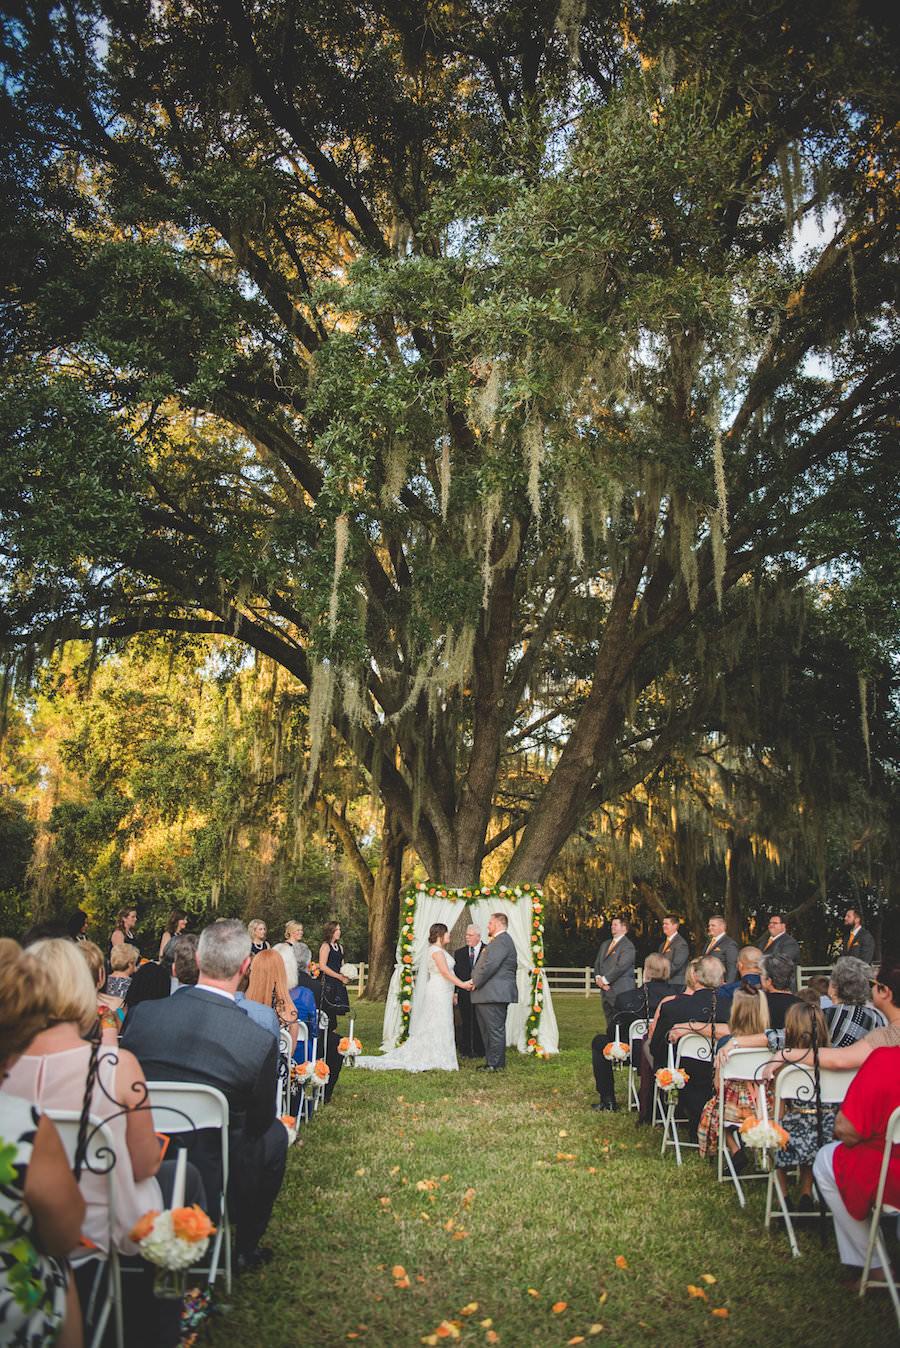 Outdoor Dade City Bride and Groom Wedding Ceremony Portrait | Rustic Dade City Wedding Venue | Outdoor Rustic Tampa Bay Wedding Ceremony with Large Oak Trees | The Lange Farm